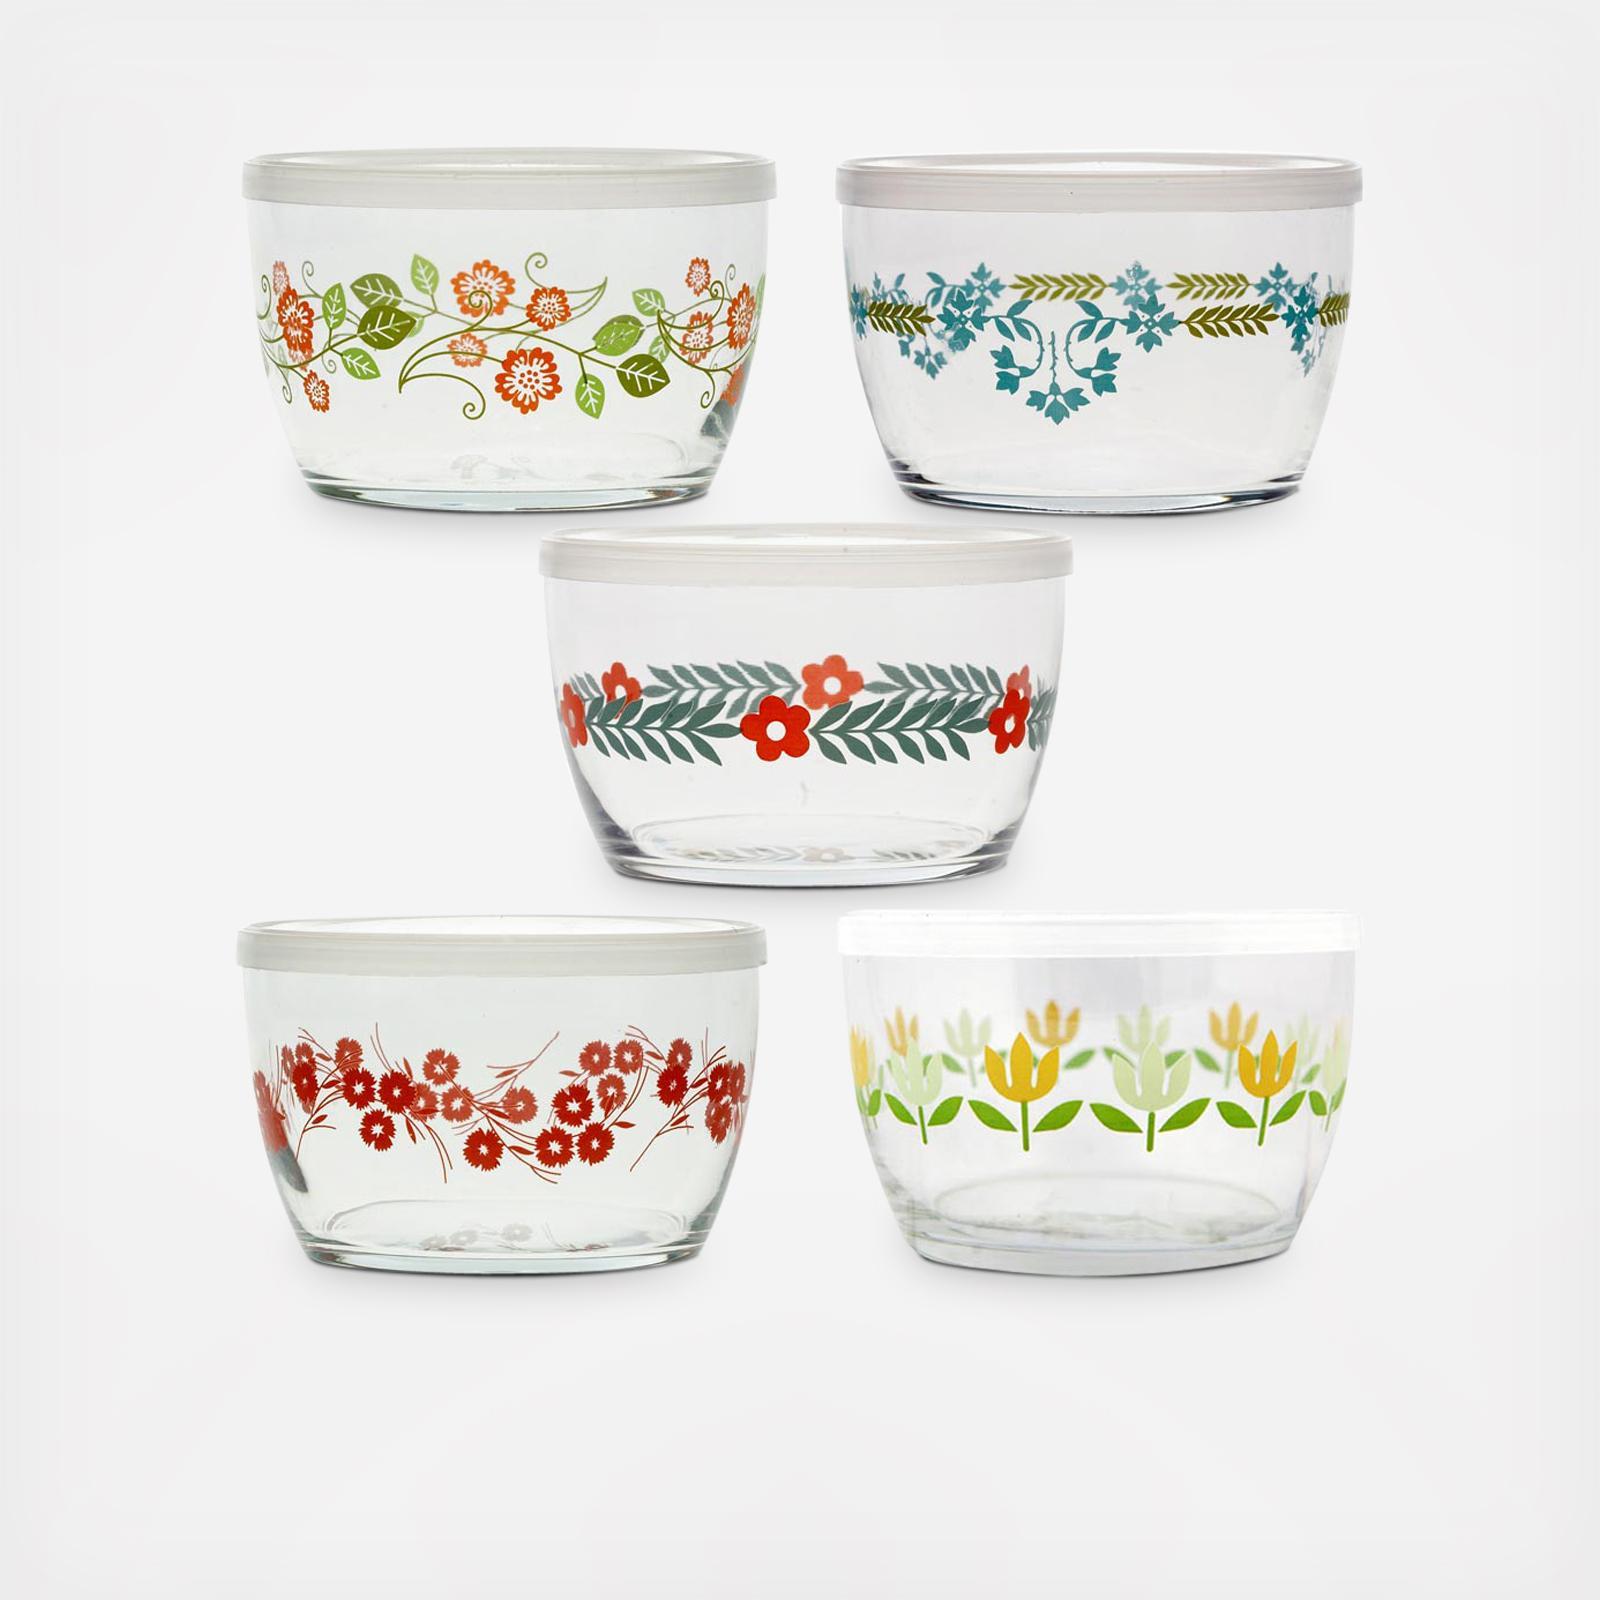 Vintage Flower Storage Bowl Set of 5 Zola